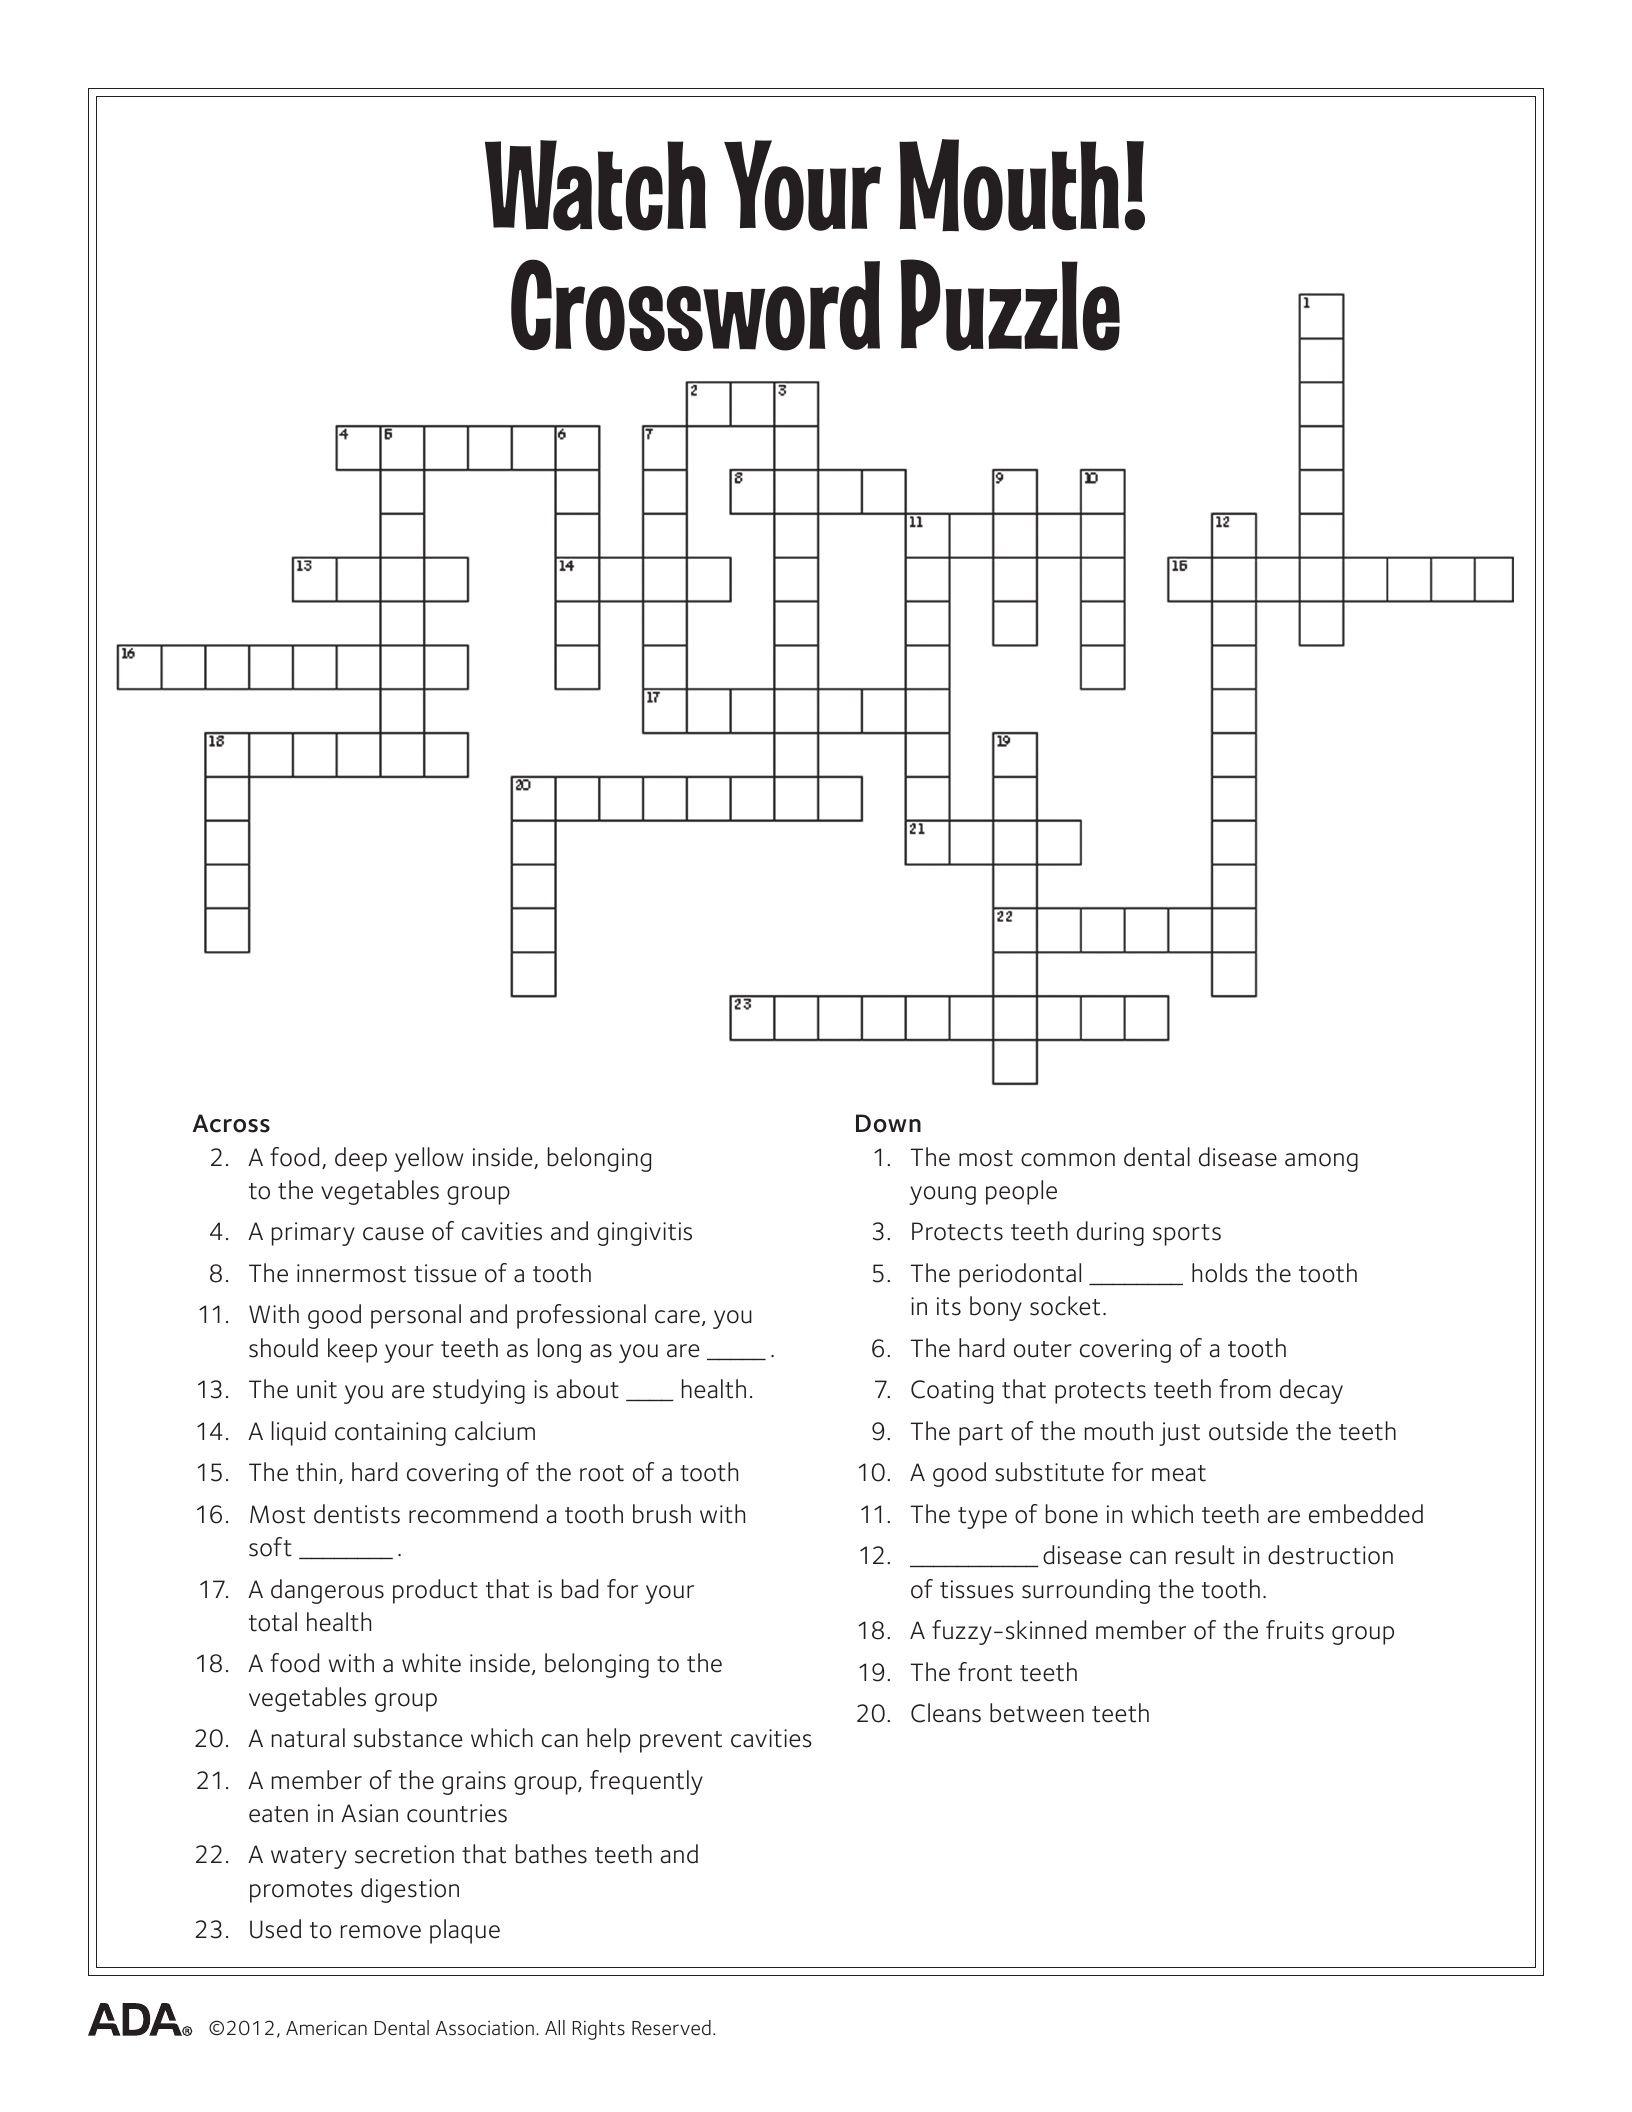 11 Dental Health Activities Puzzle Fun (Printable) | Dental Hygiene - Printable Crossword Puzzles 2012